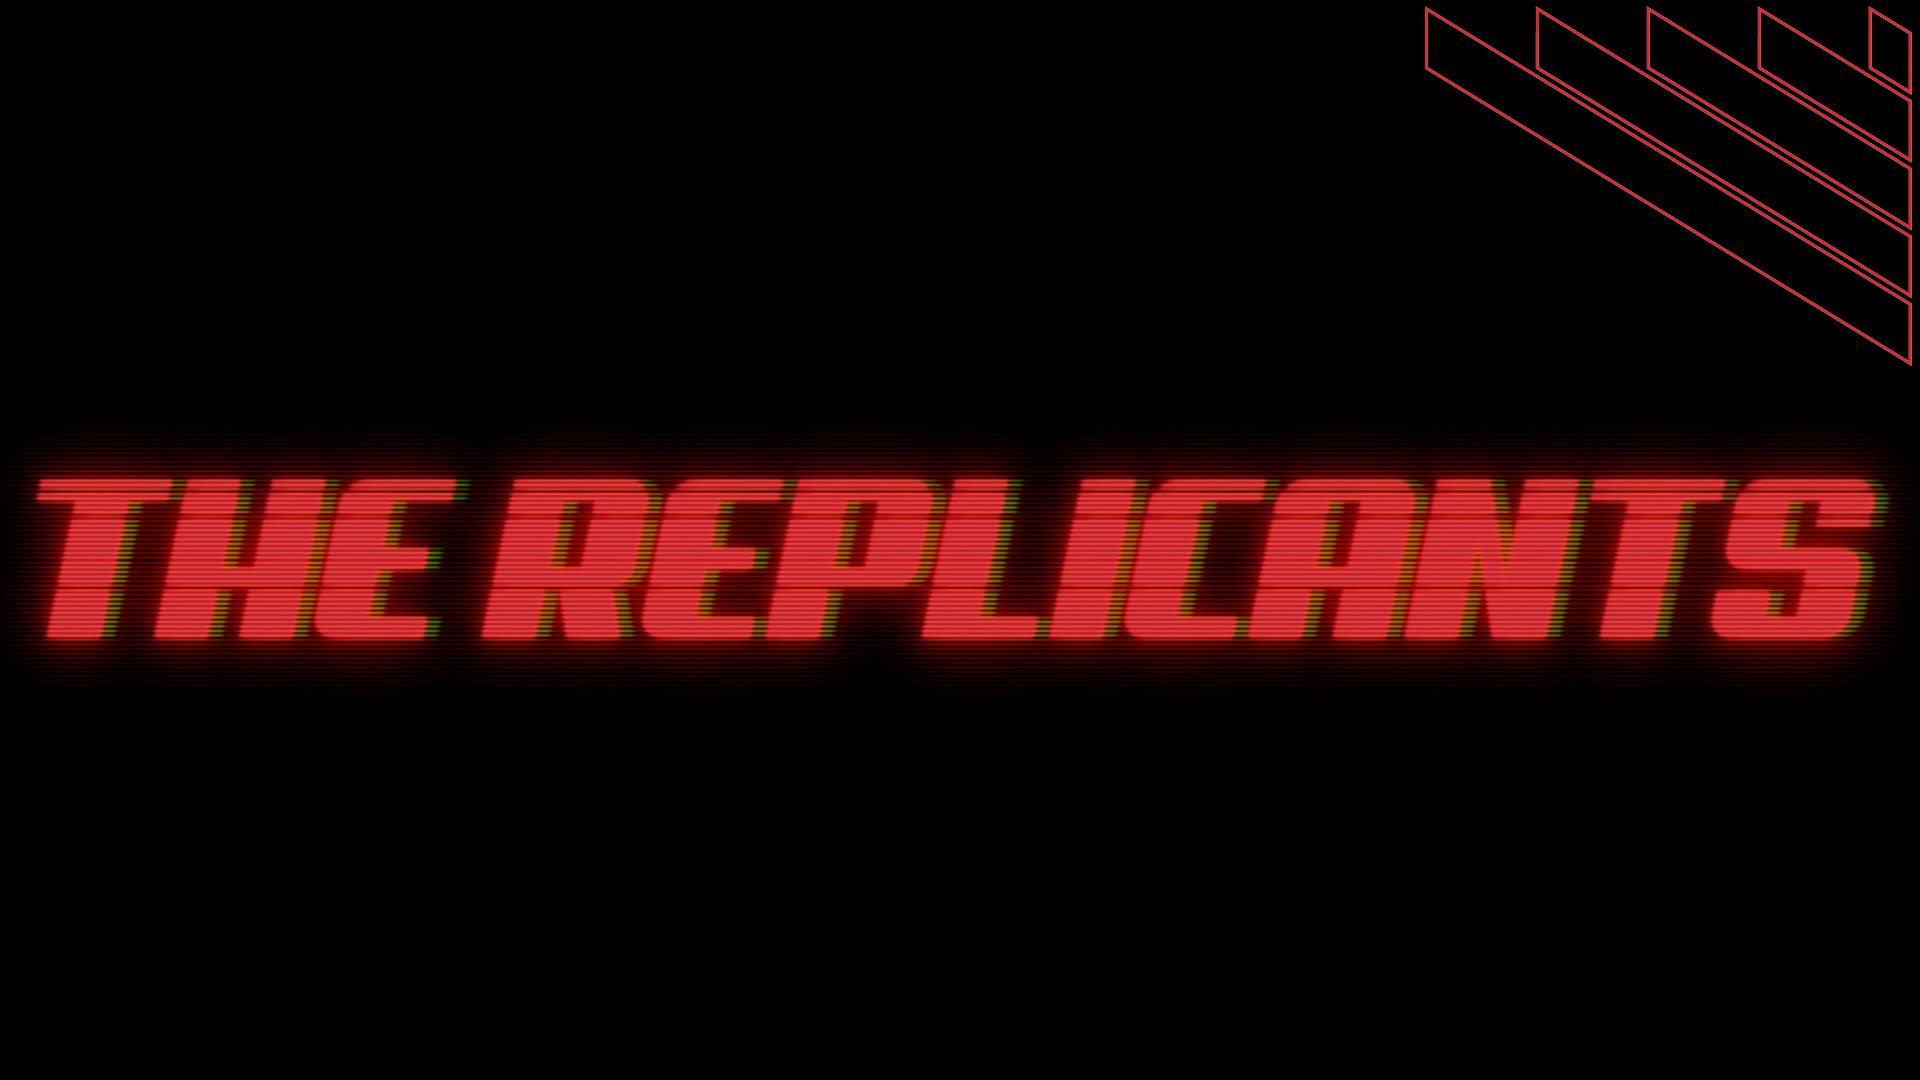 Koda: The Replicants, 19 Kasım Pazartesi, Pan's Social House